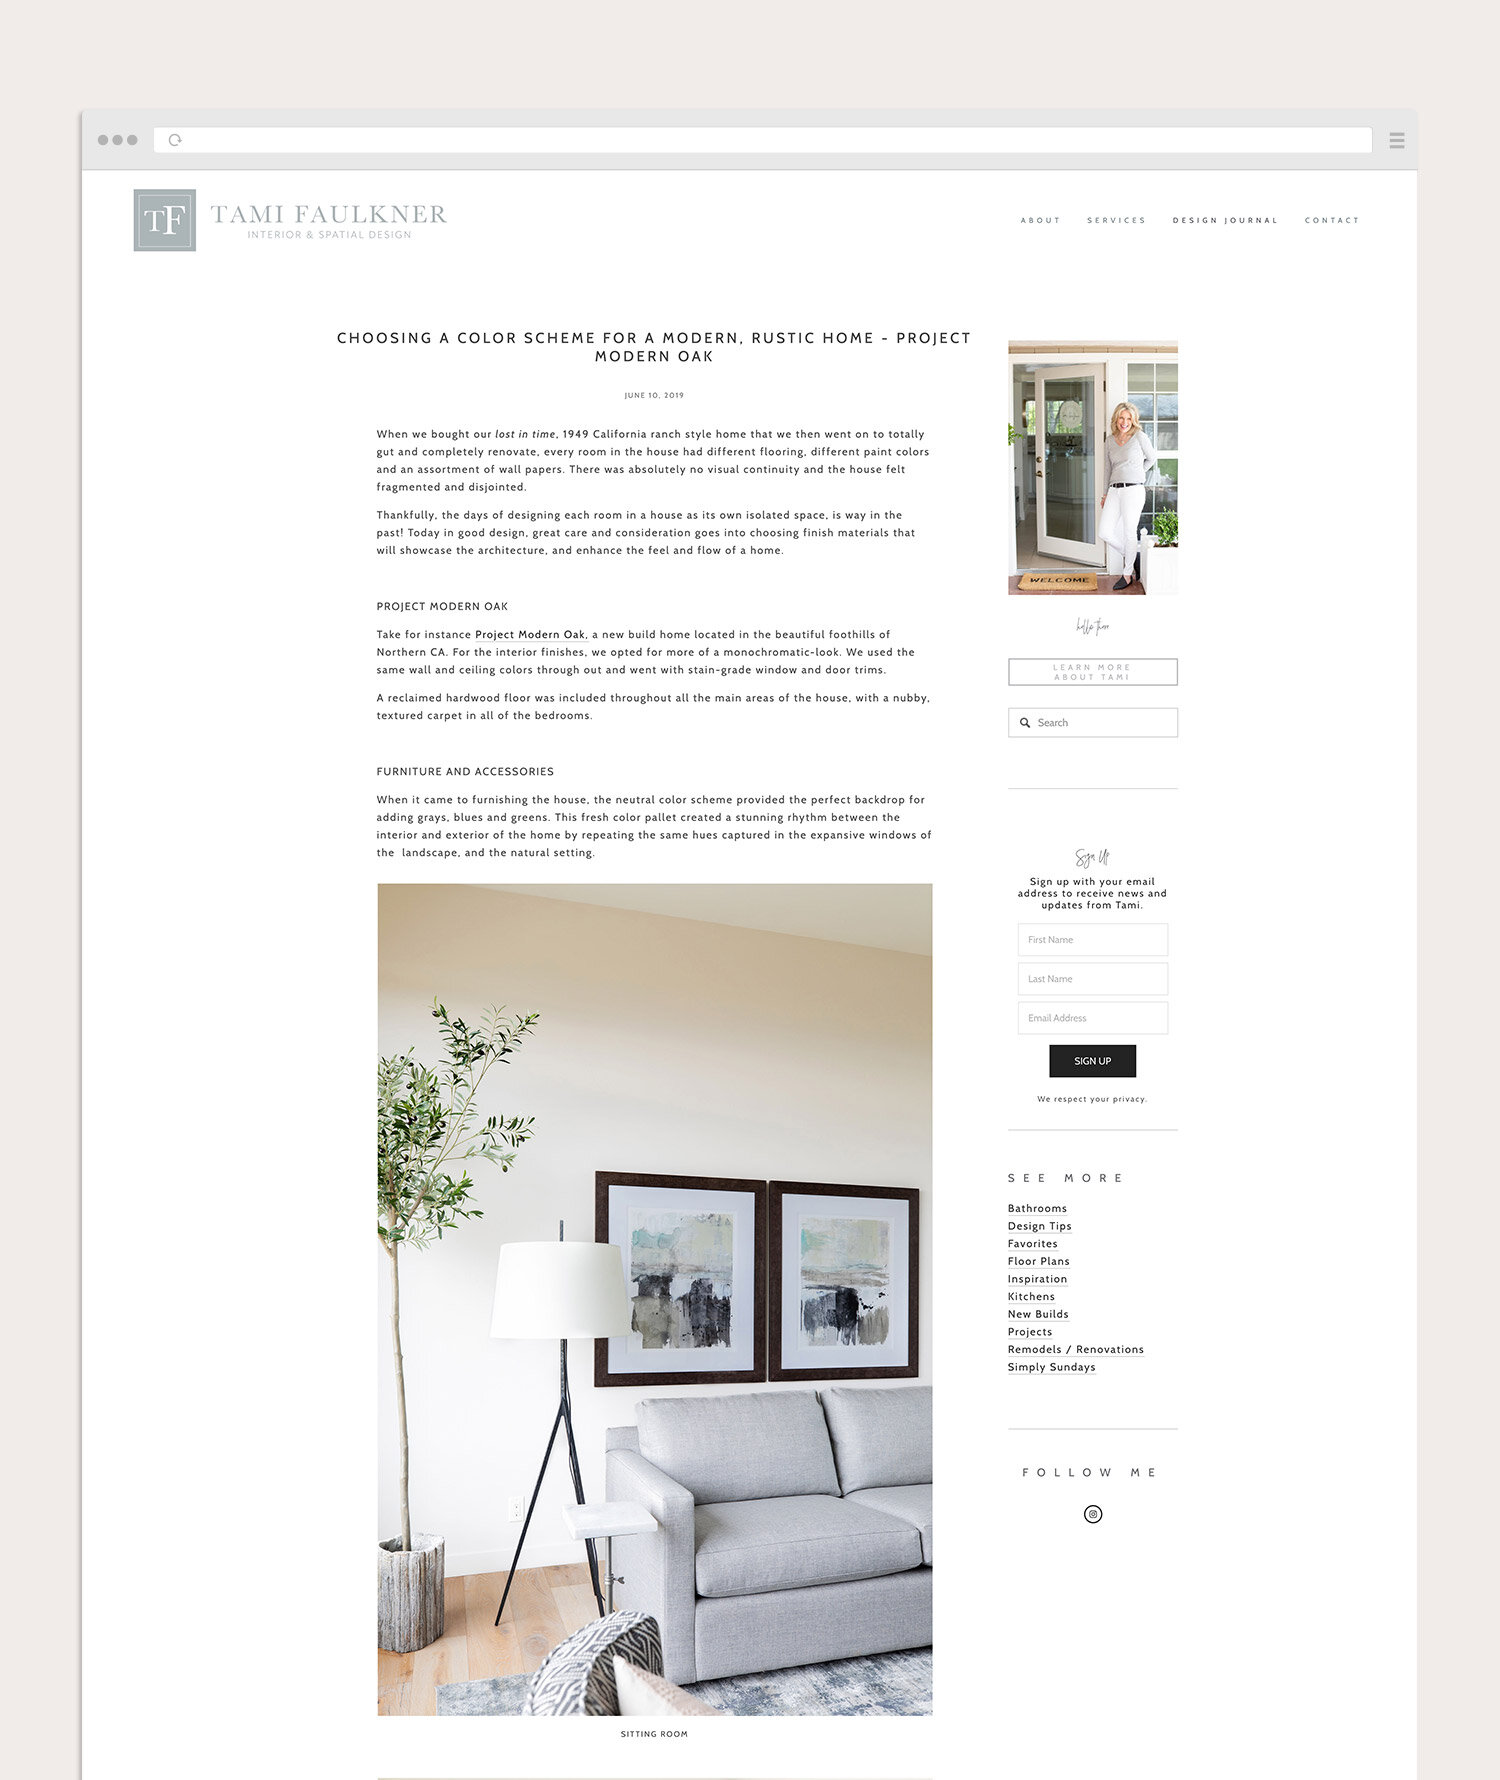 Blog page for an interior designer | website design by Jodi Neufeld Design